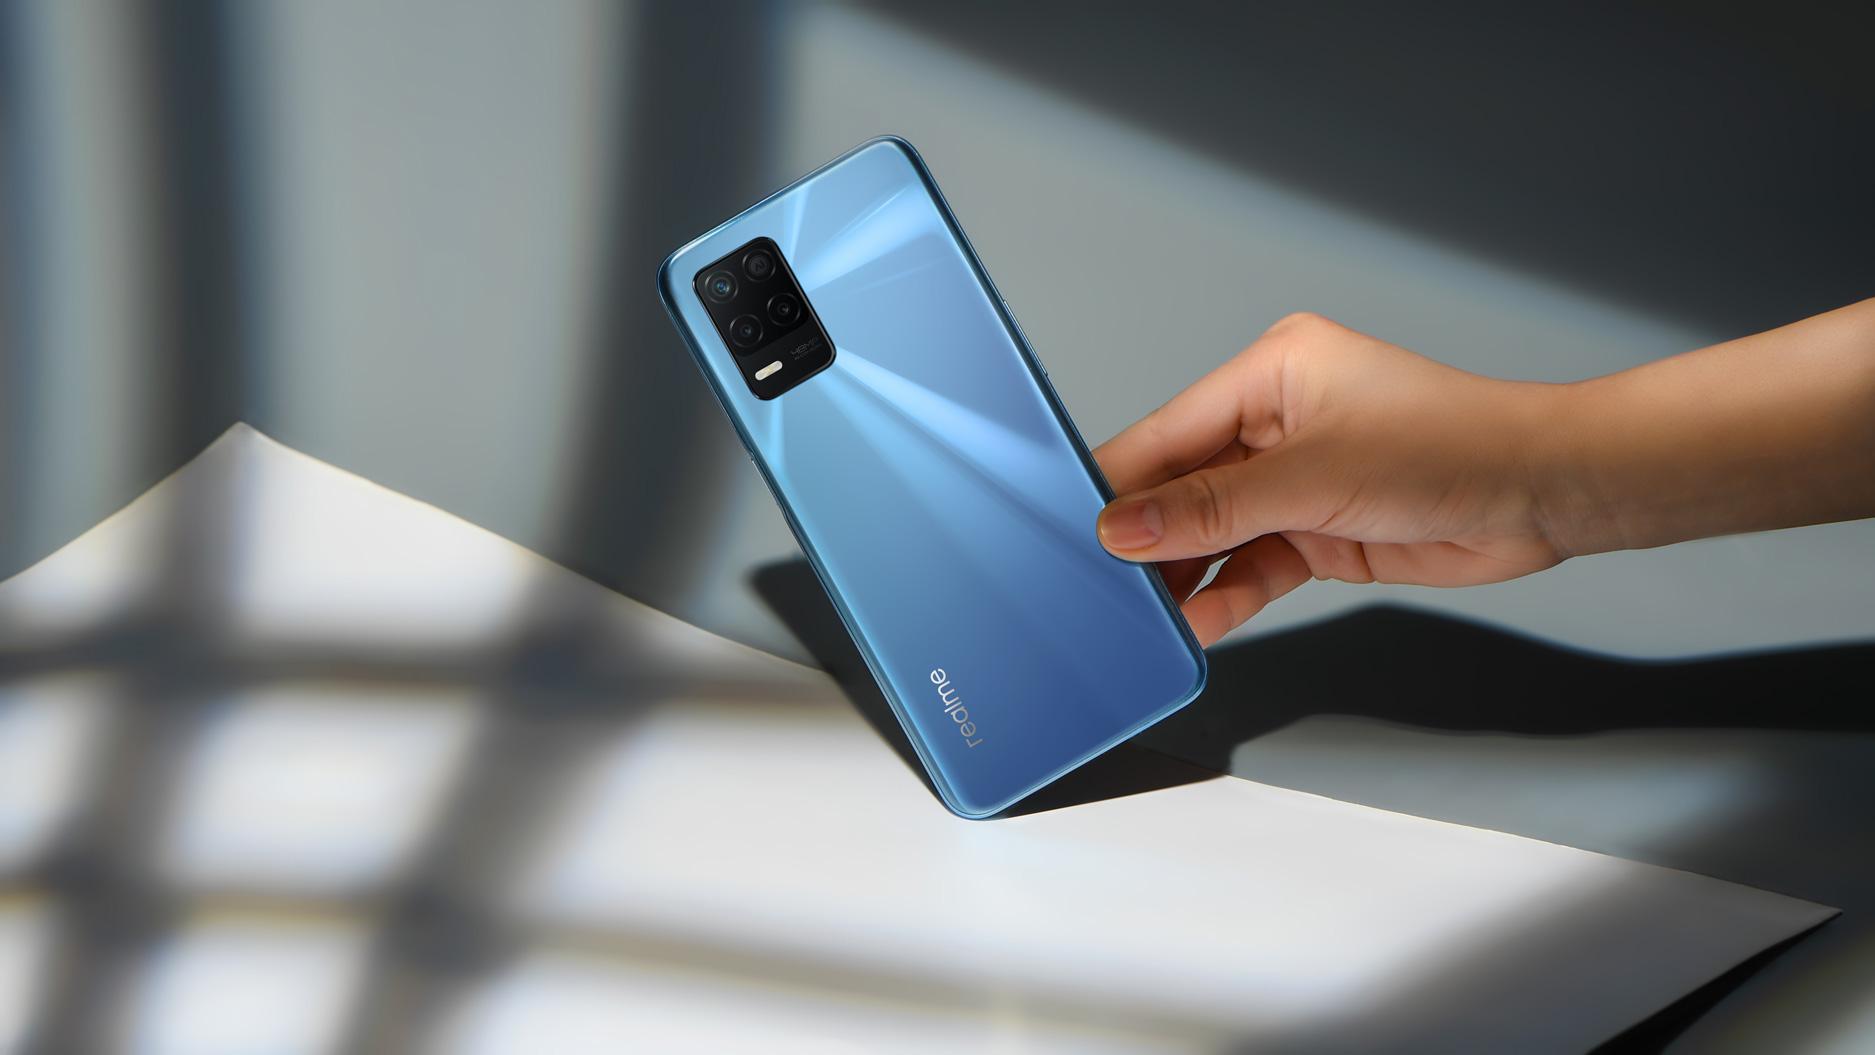 realme 8 5G: φέρνει την τεχνολογία 5G σε όλους